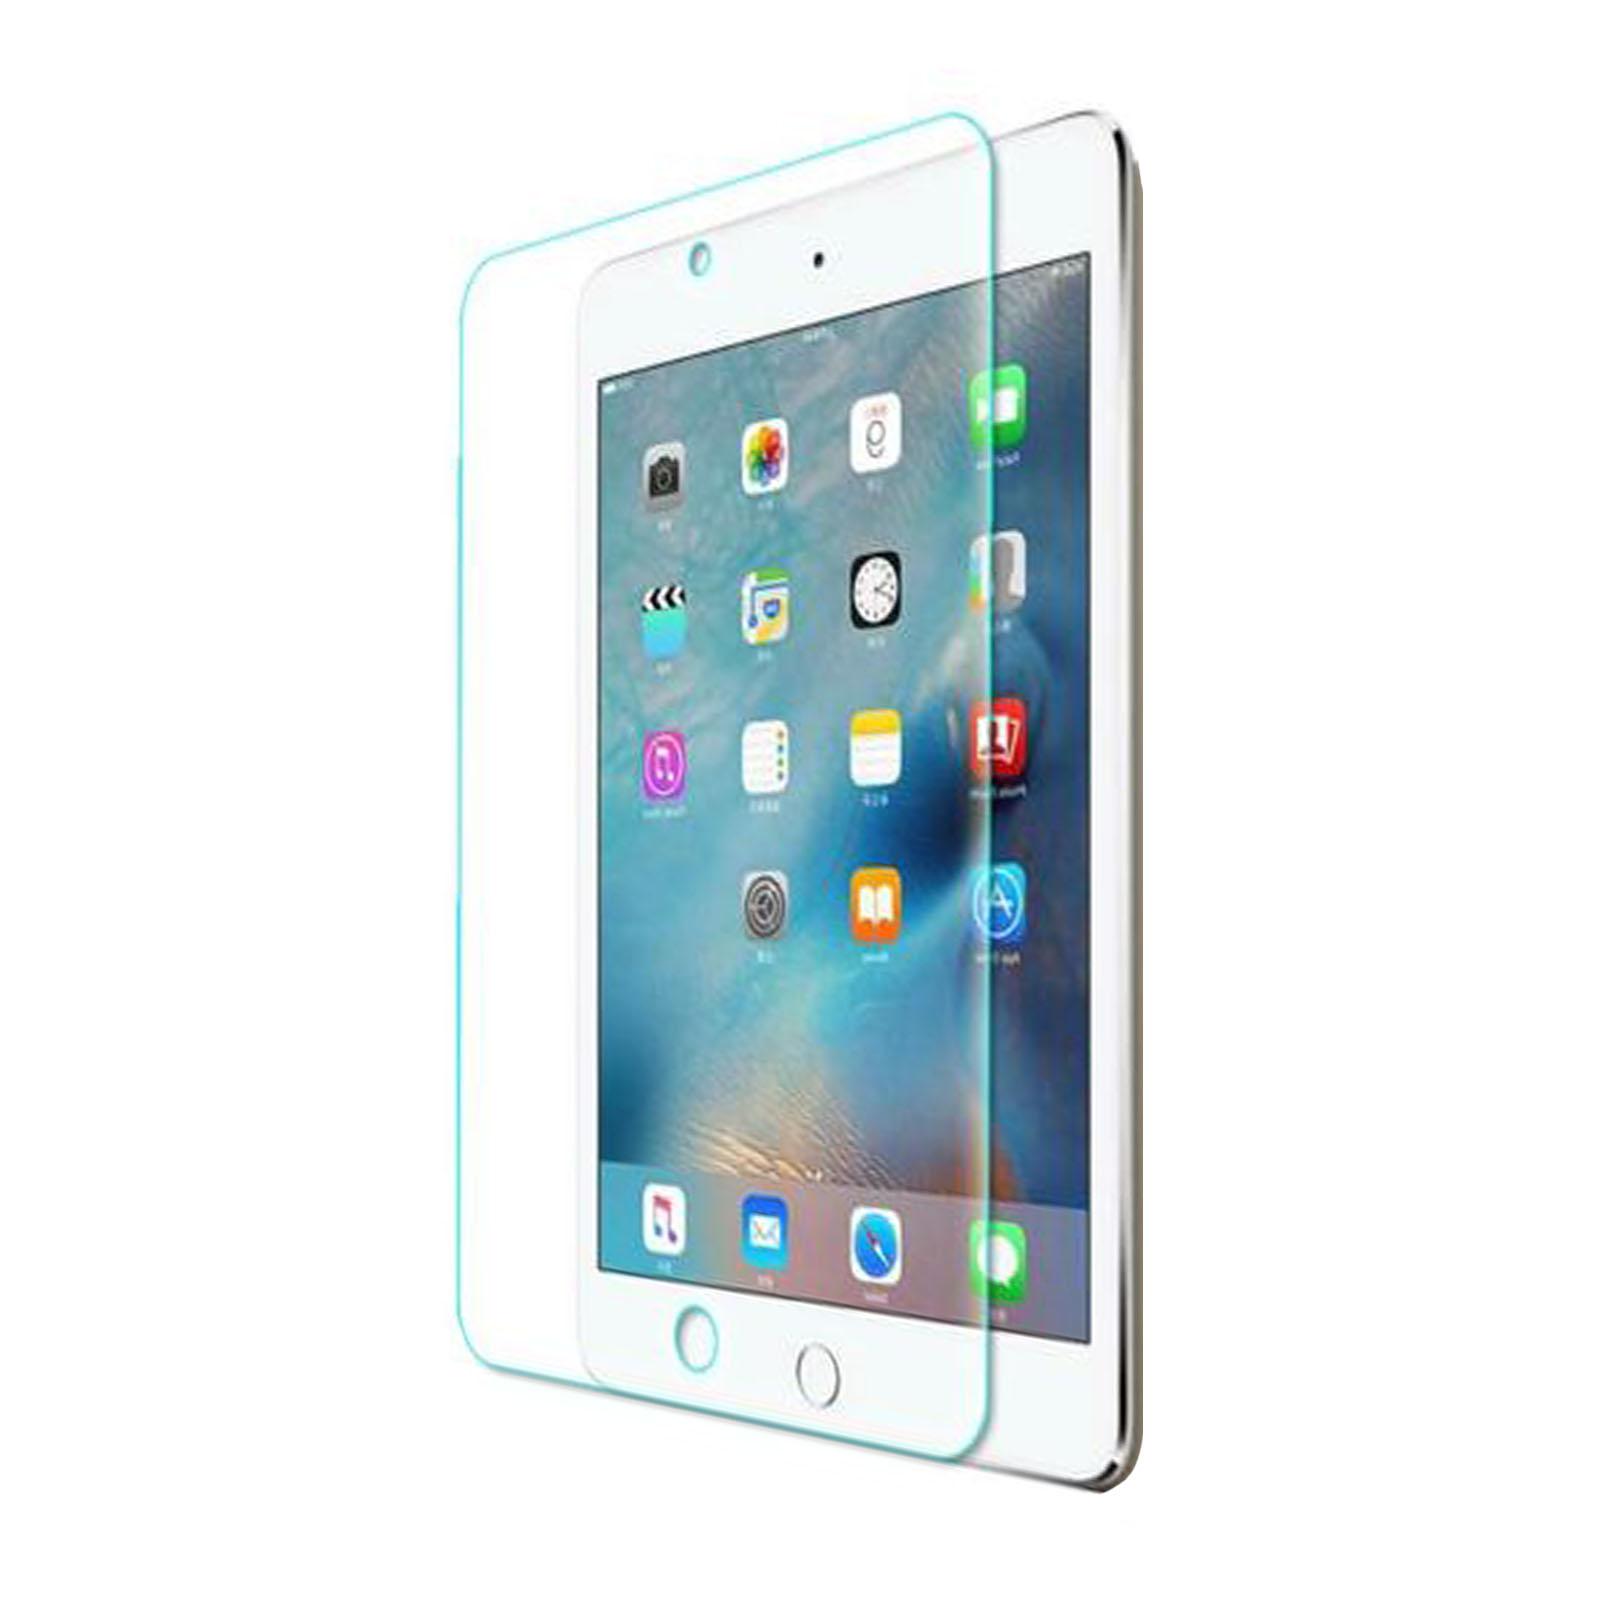 iPad Screen Protection